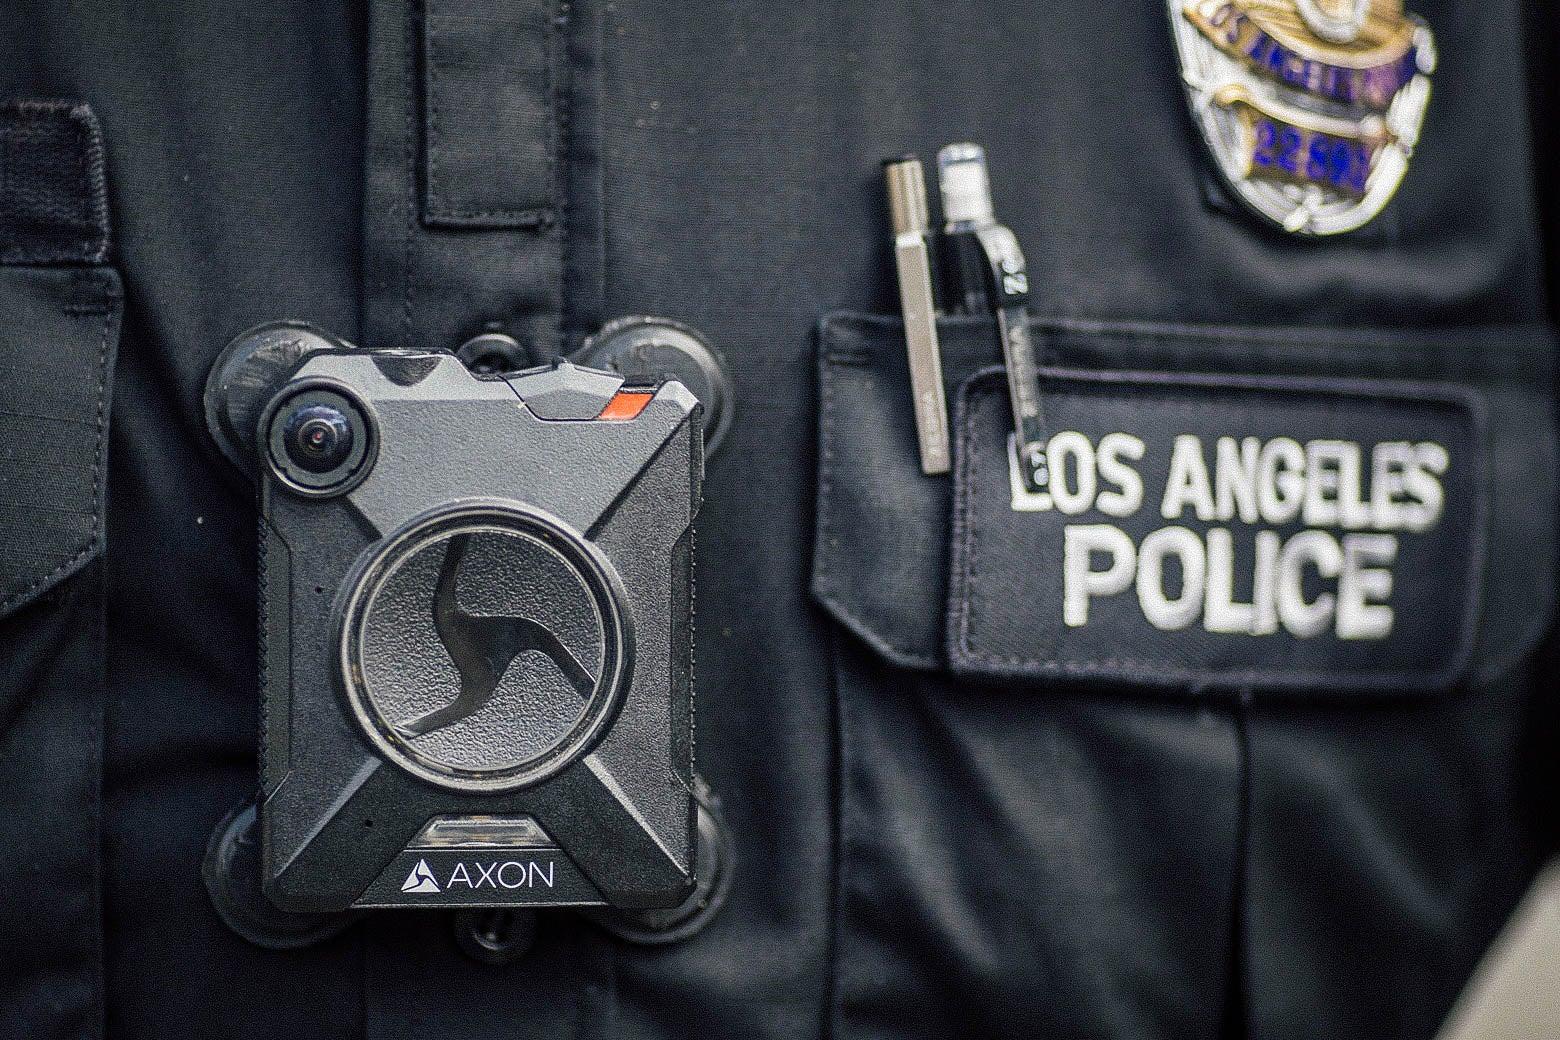 A police officer wears an Axon body camera.